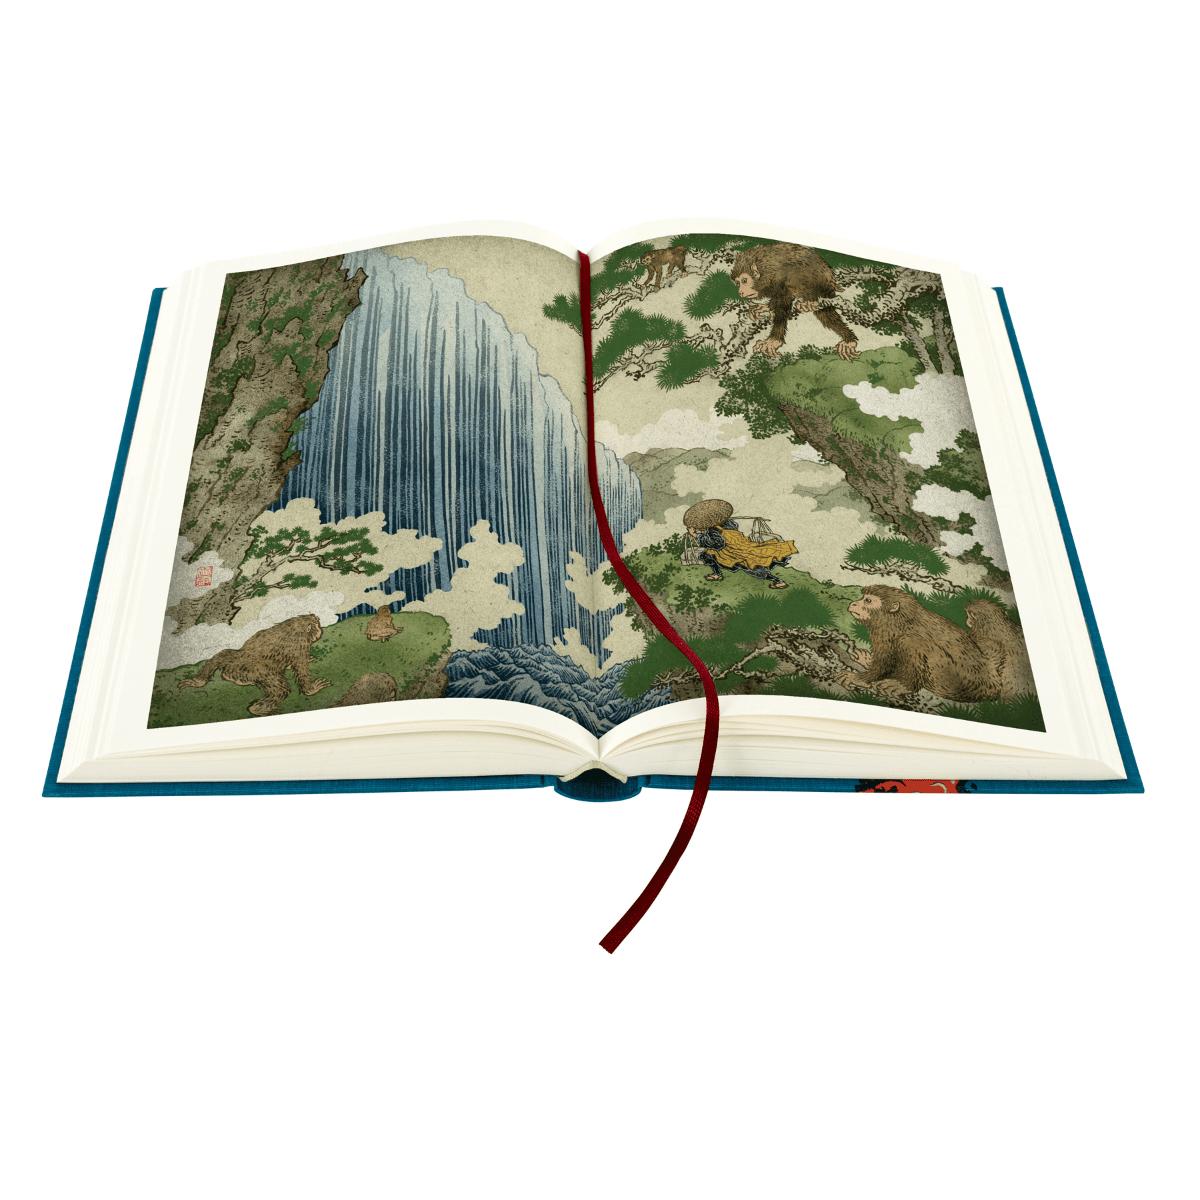 FS Japanese Tales spread